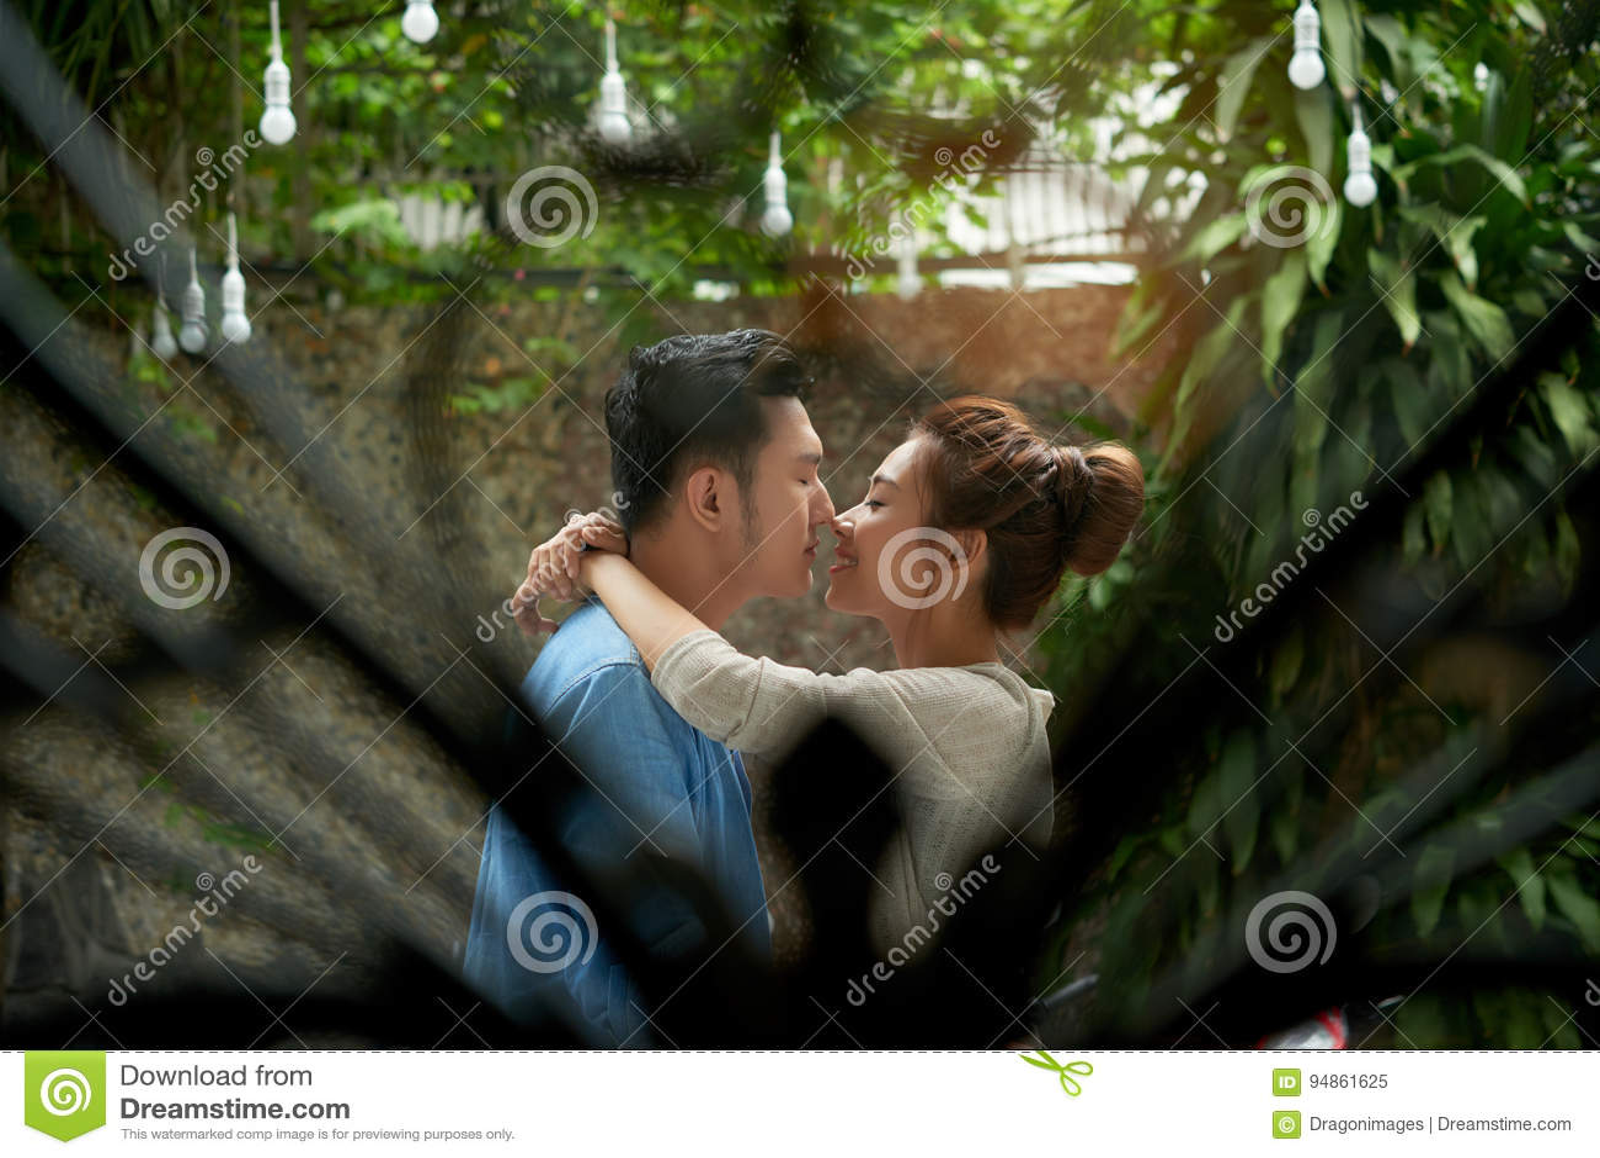 Young Secret Love